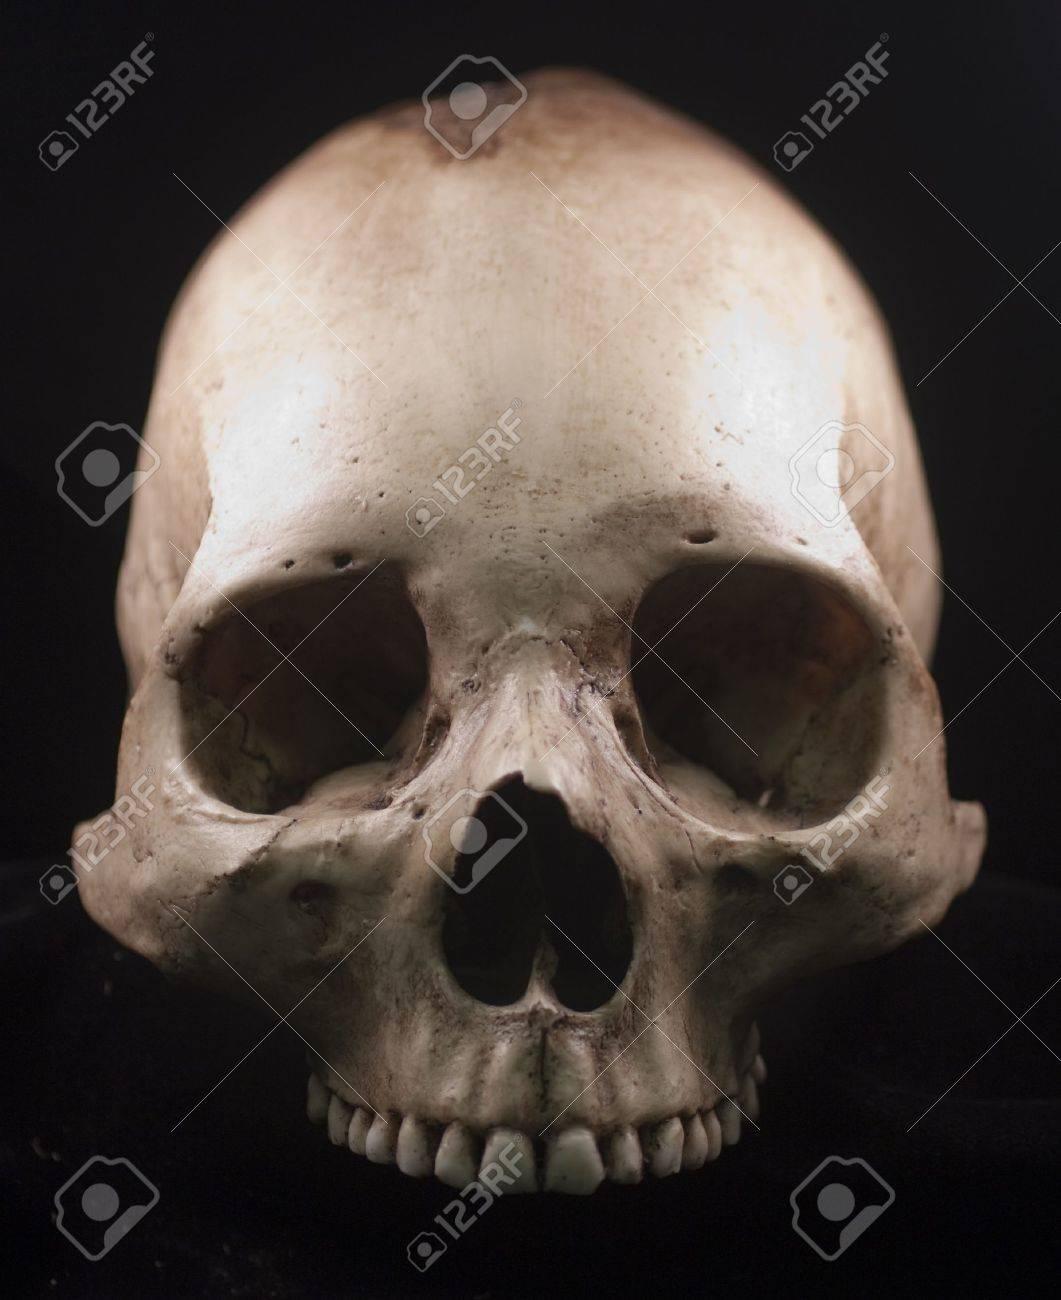 Human skull - bone head dead teeth spooky scary pirate isolated evil Stock Photo - 9895705